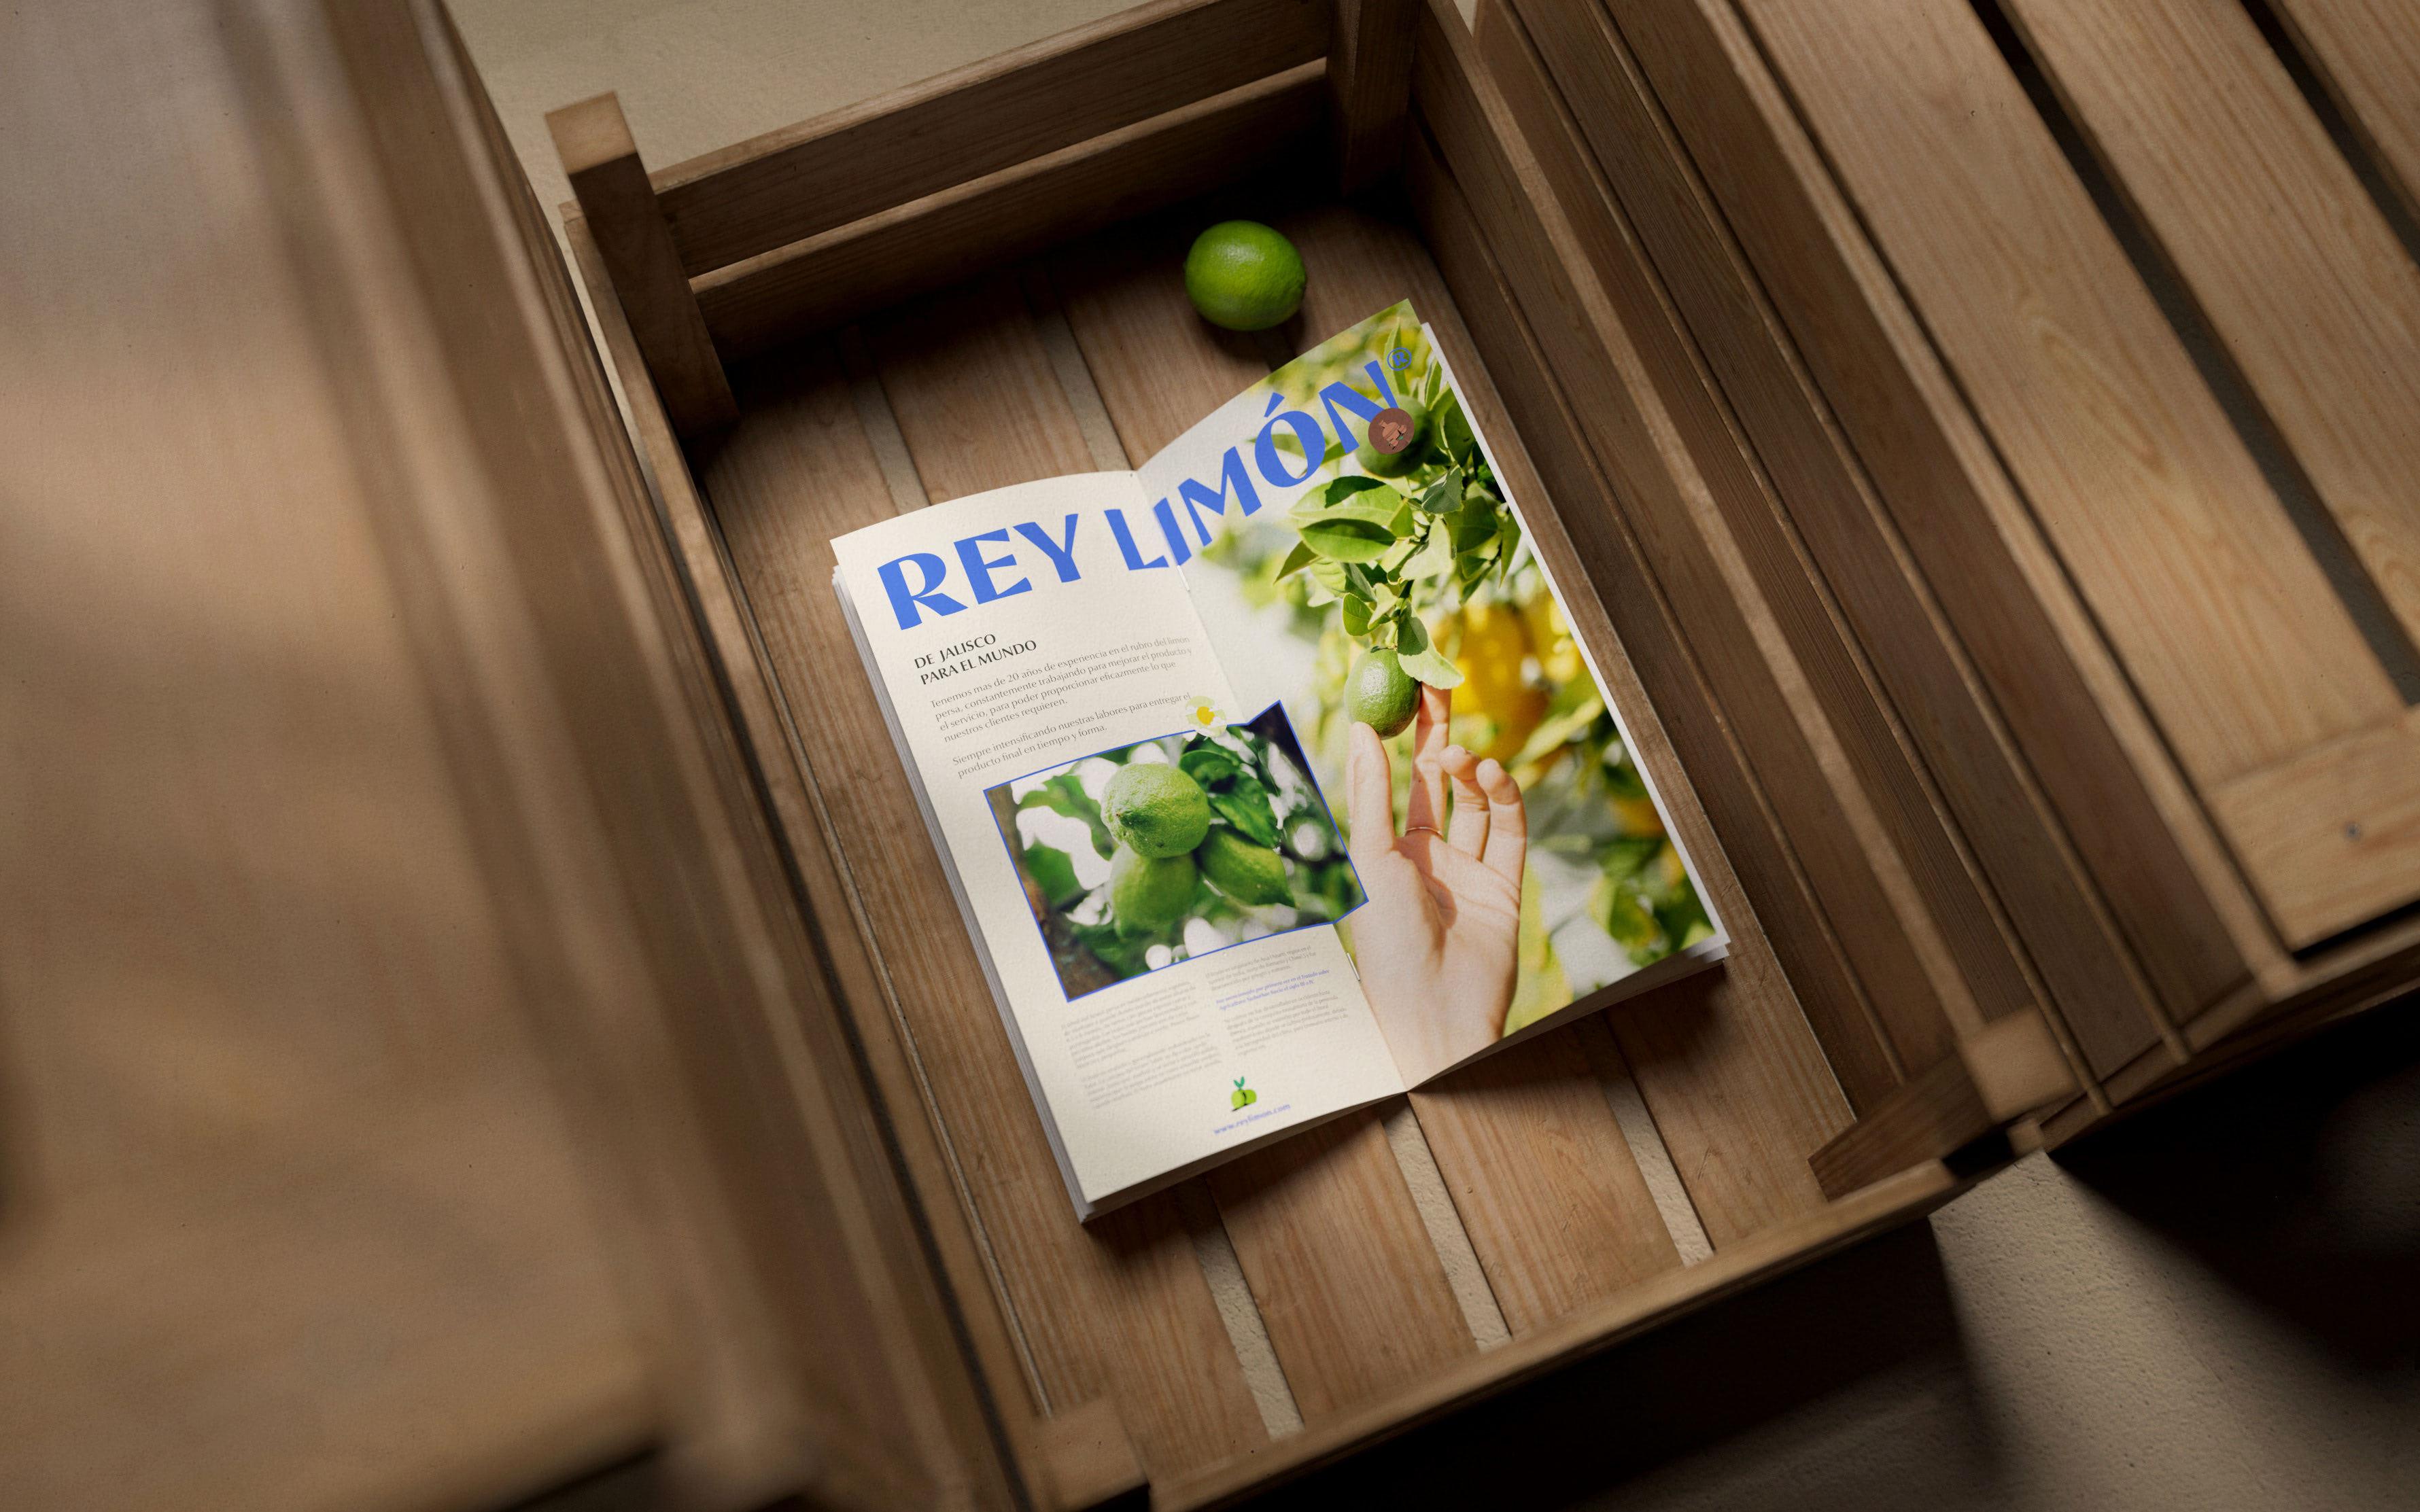 Rey-Limon-010